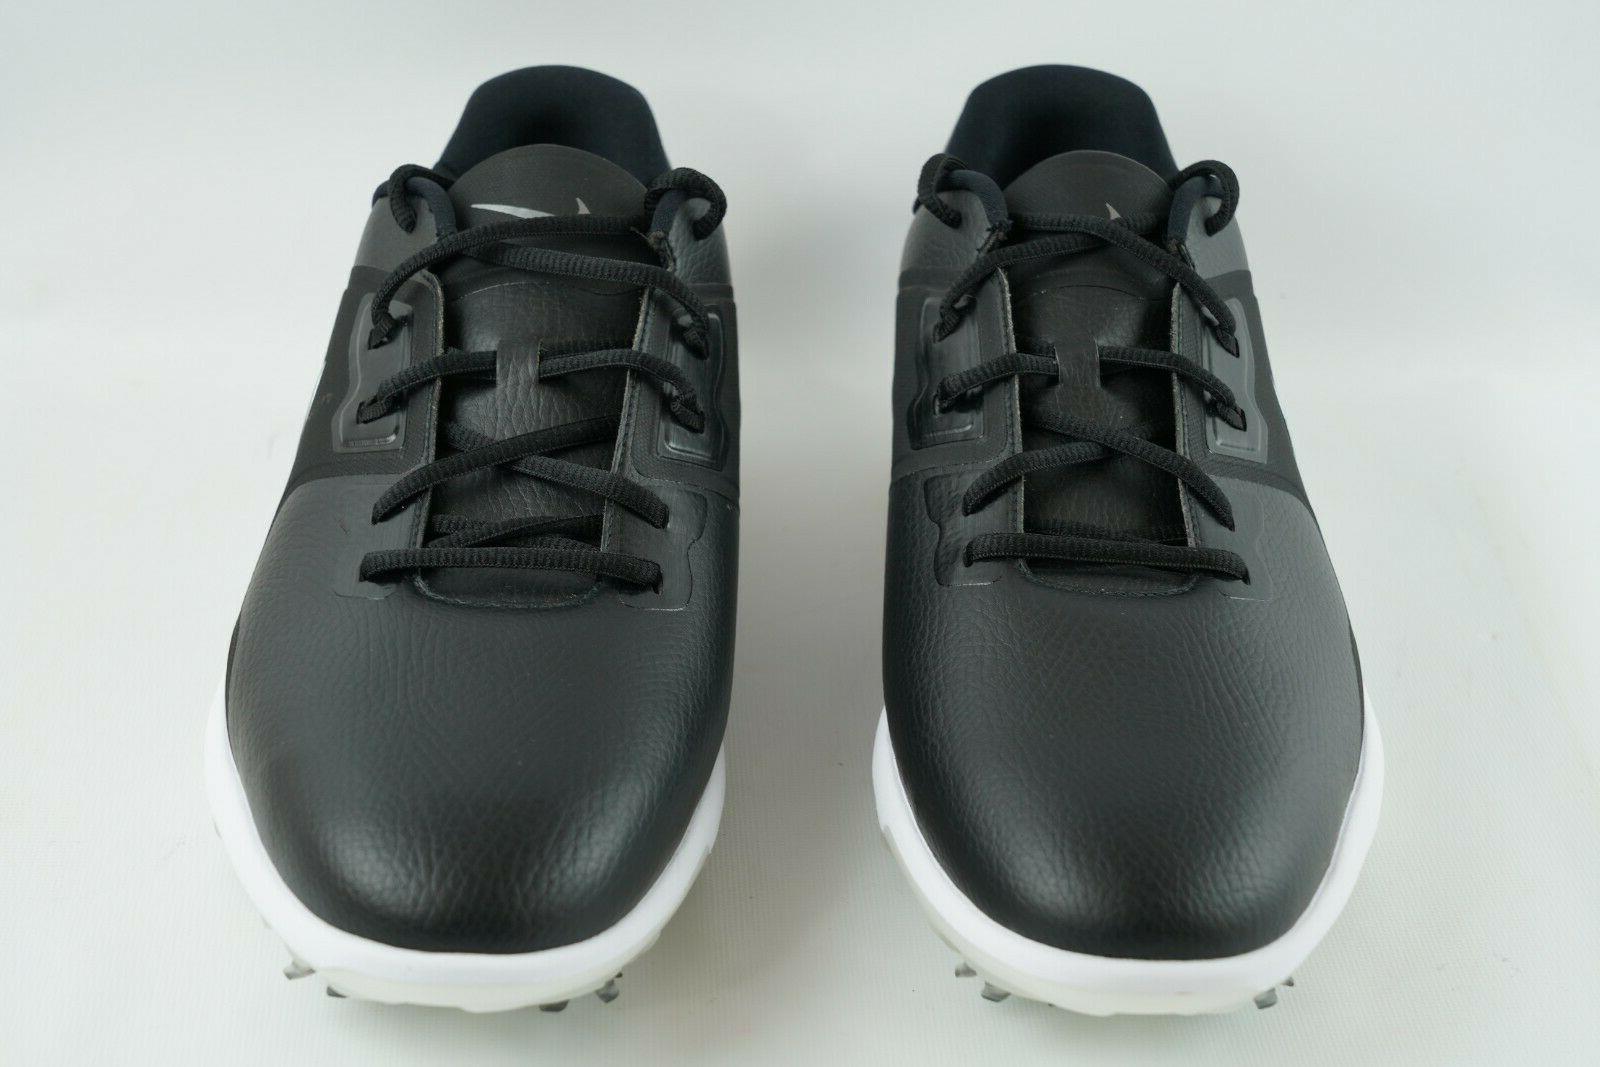 Shoes Waterproof White AQ2197-001 Men's Size